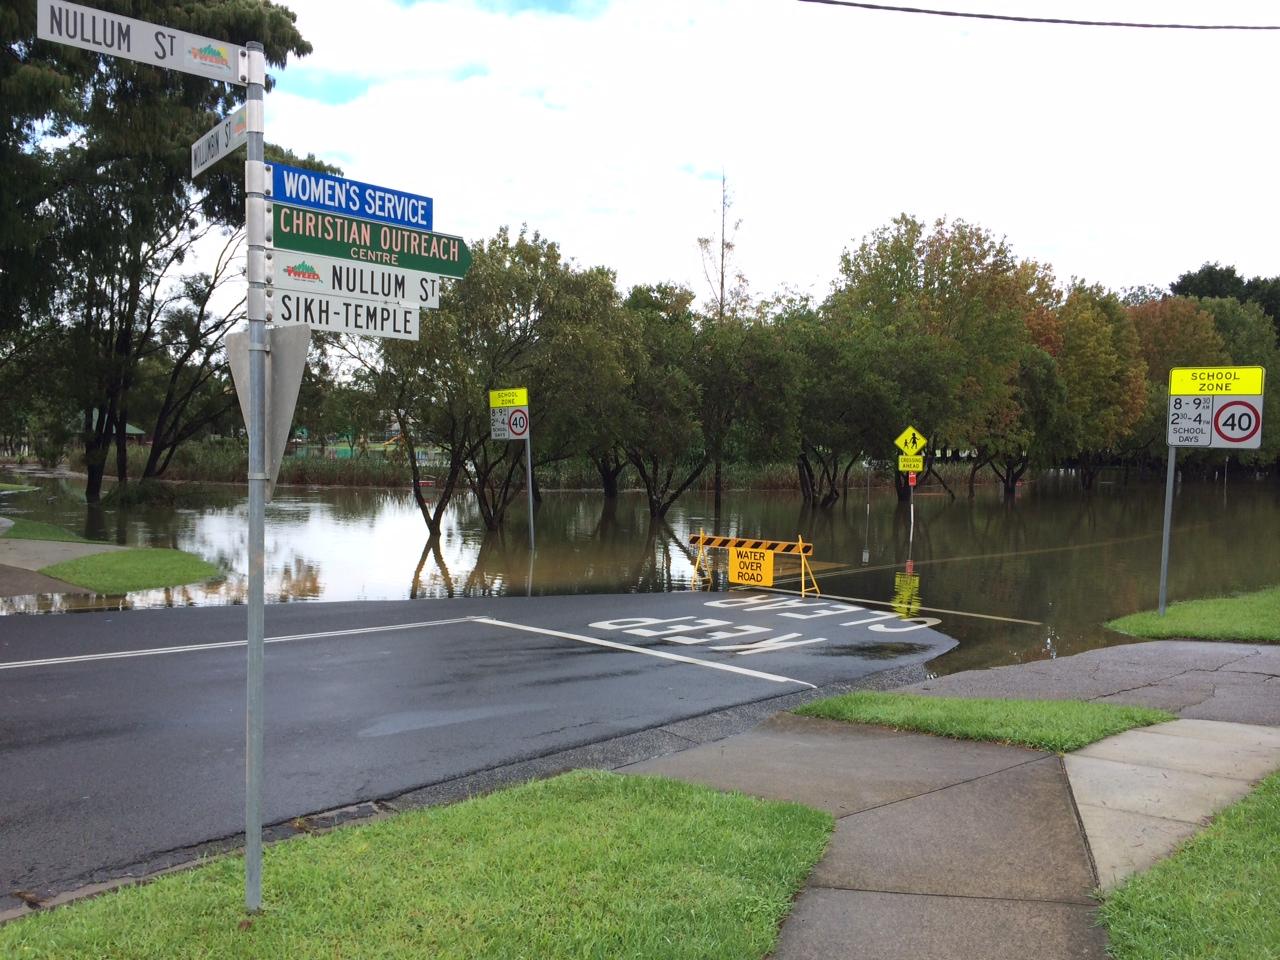 Nullum St, Murwillumbah, has been closed due to heavy rains overnight.